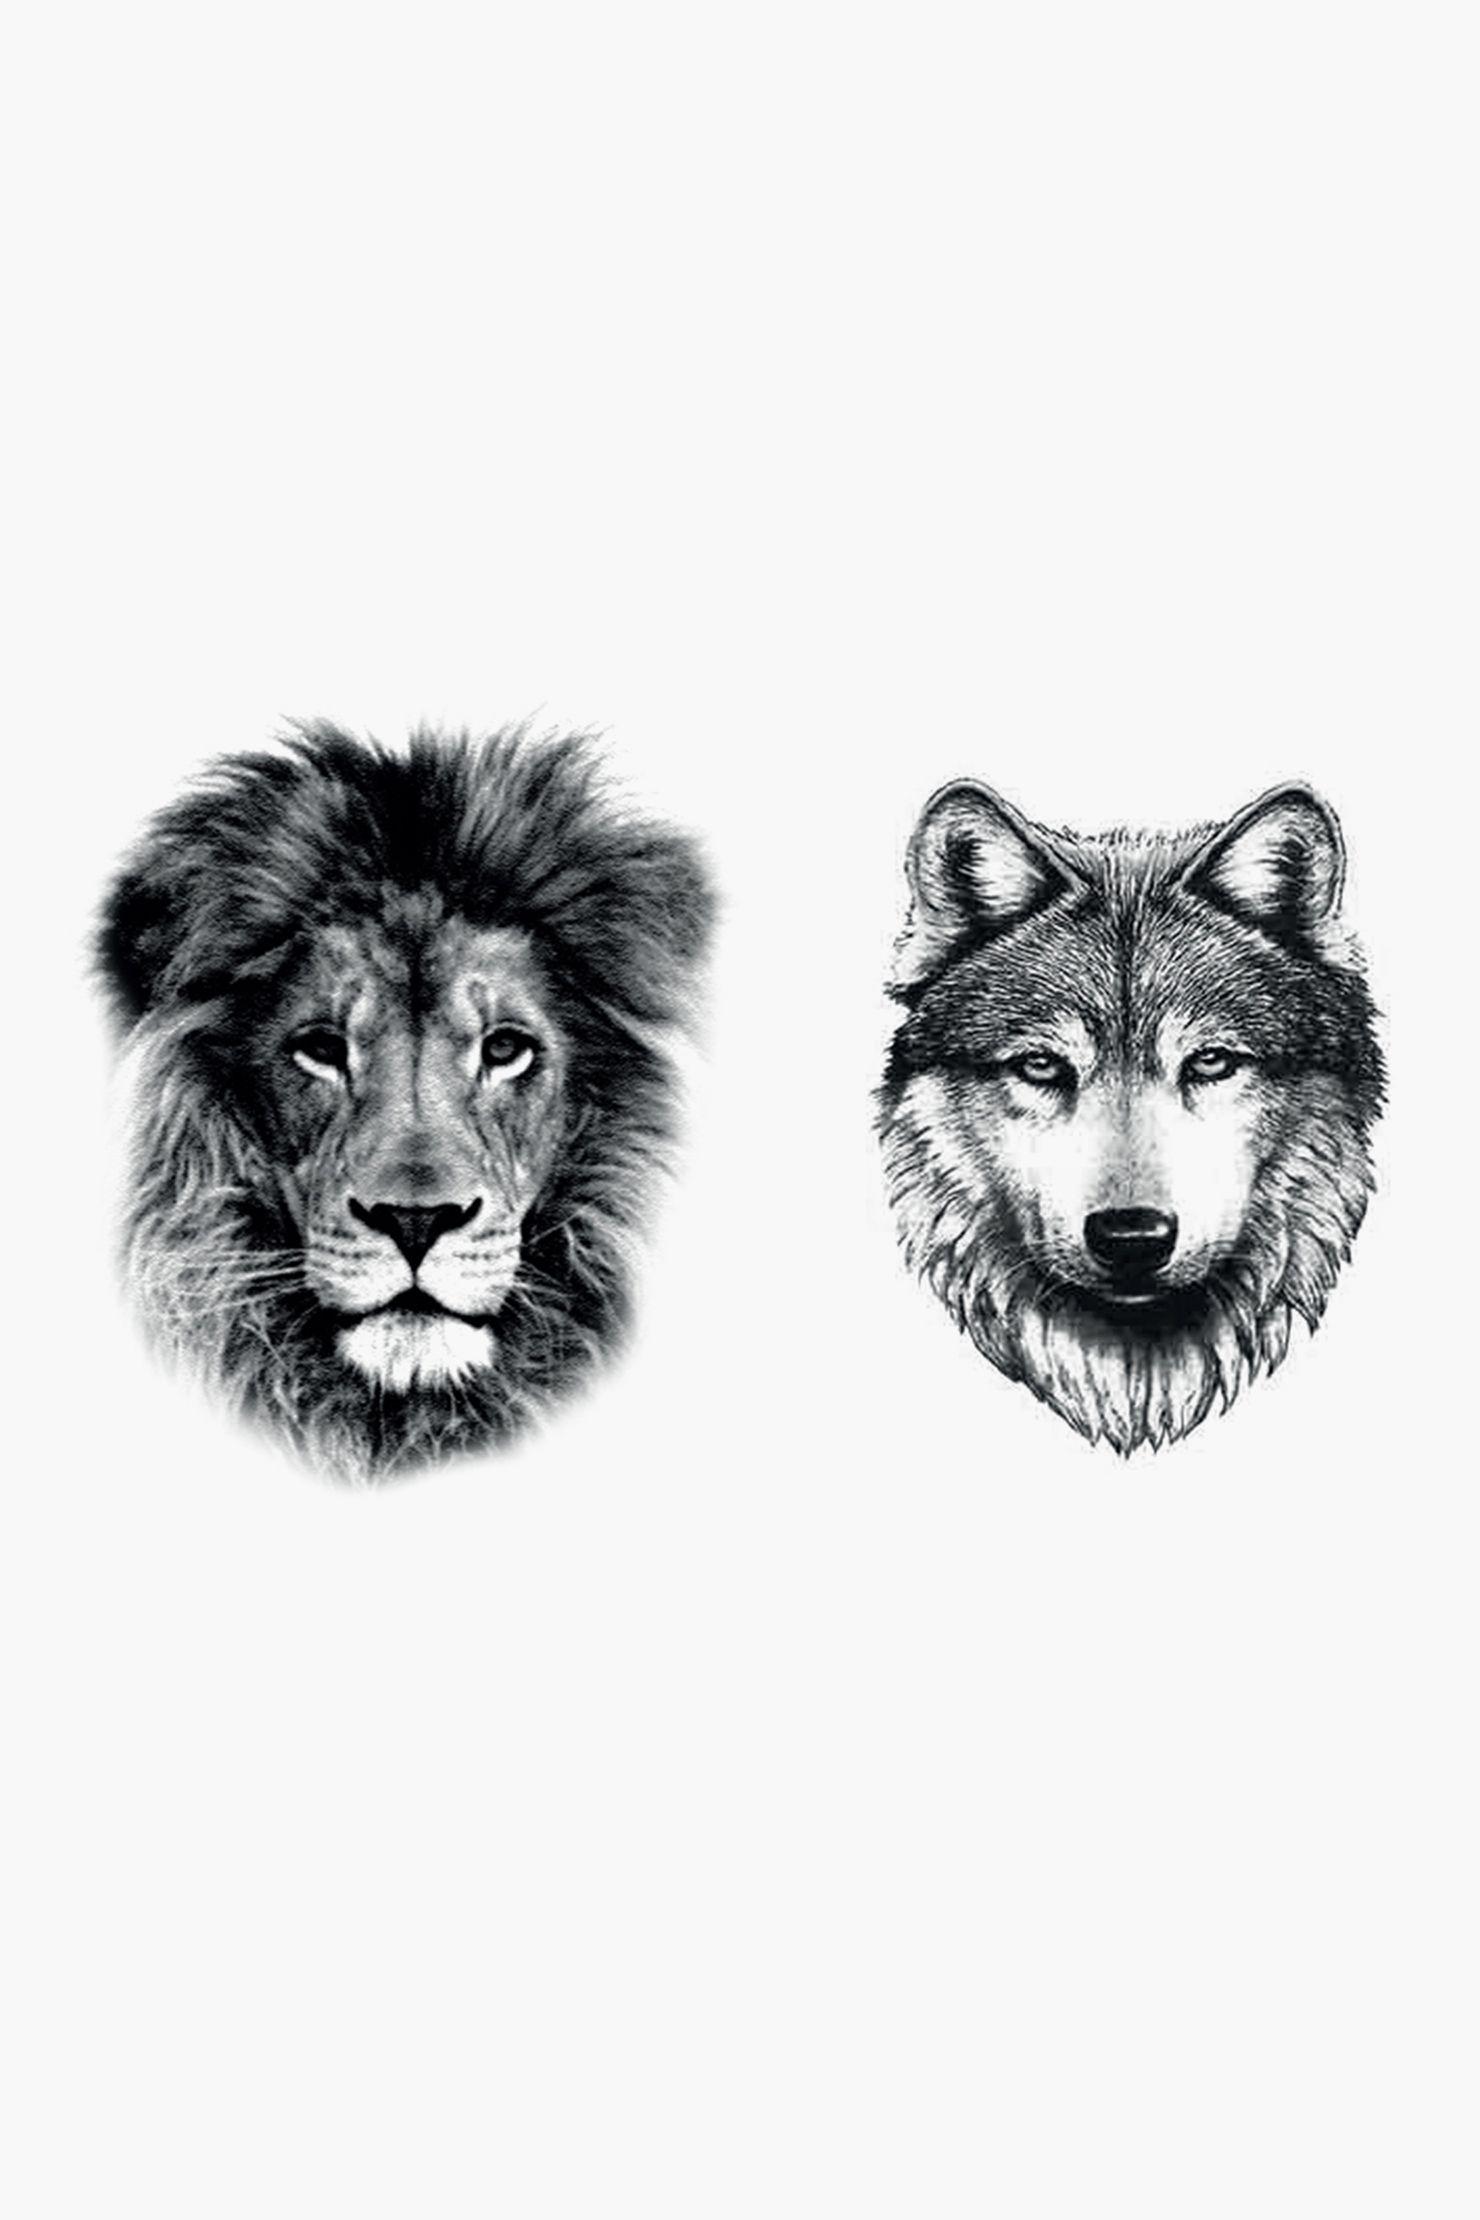 Tatoos - wolf lion tattoo - Black - Dcer   Tatoos   Pinterest